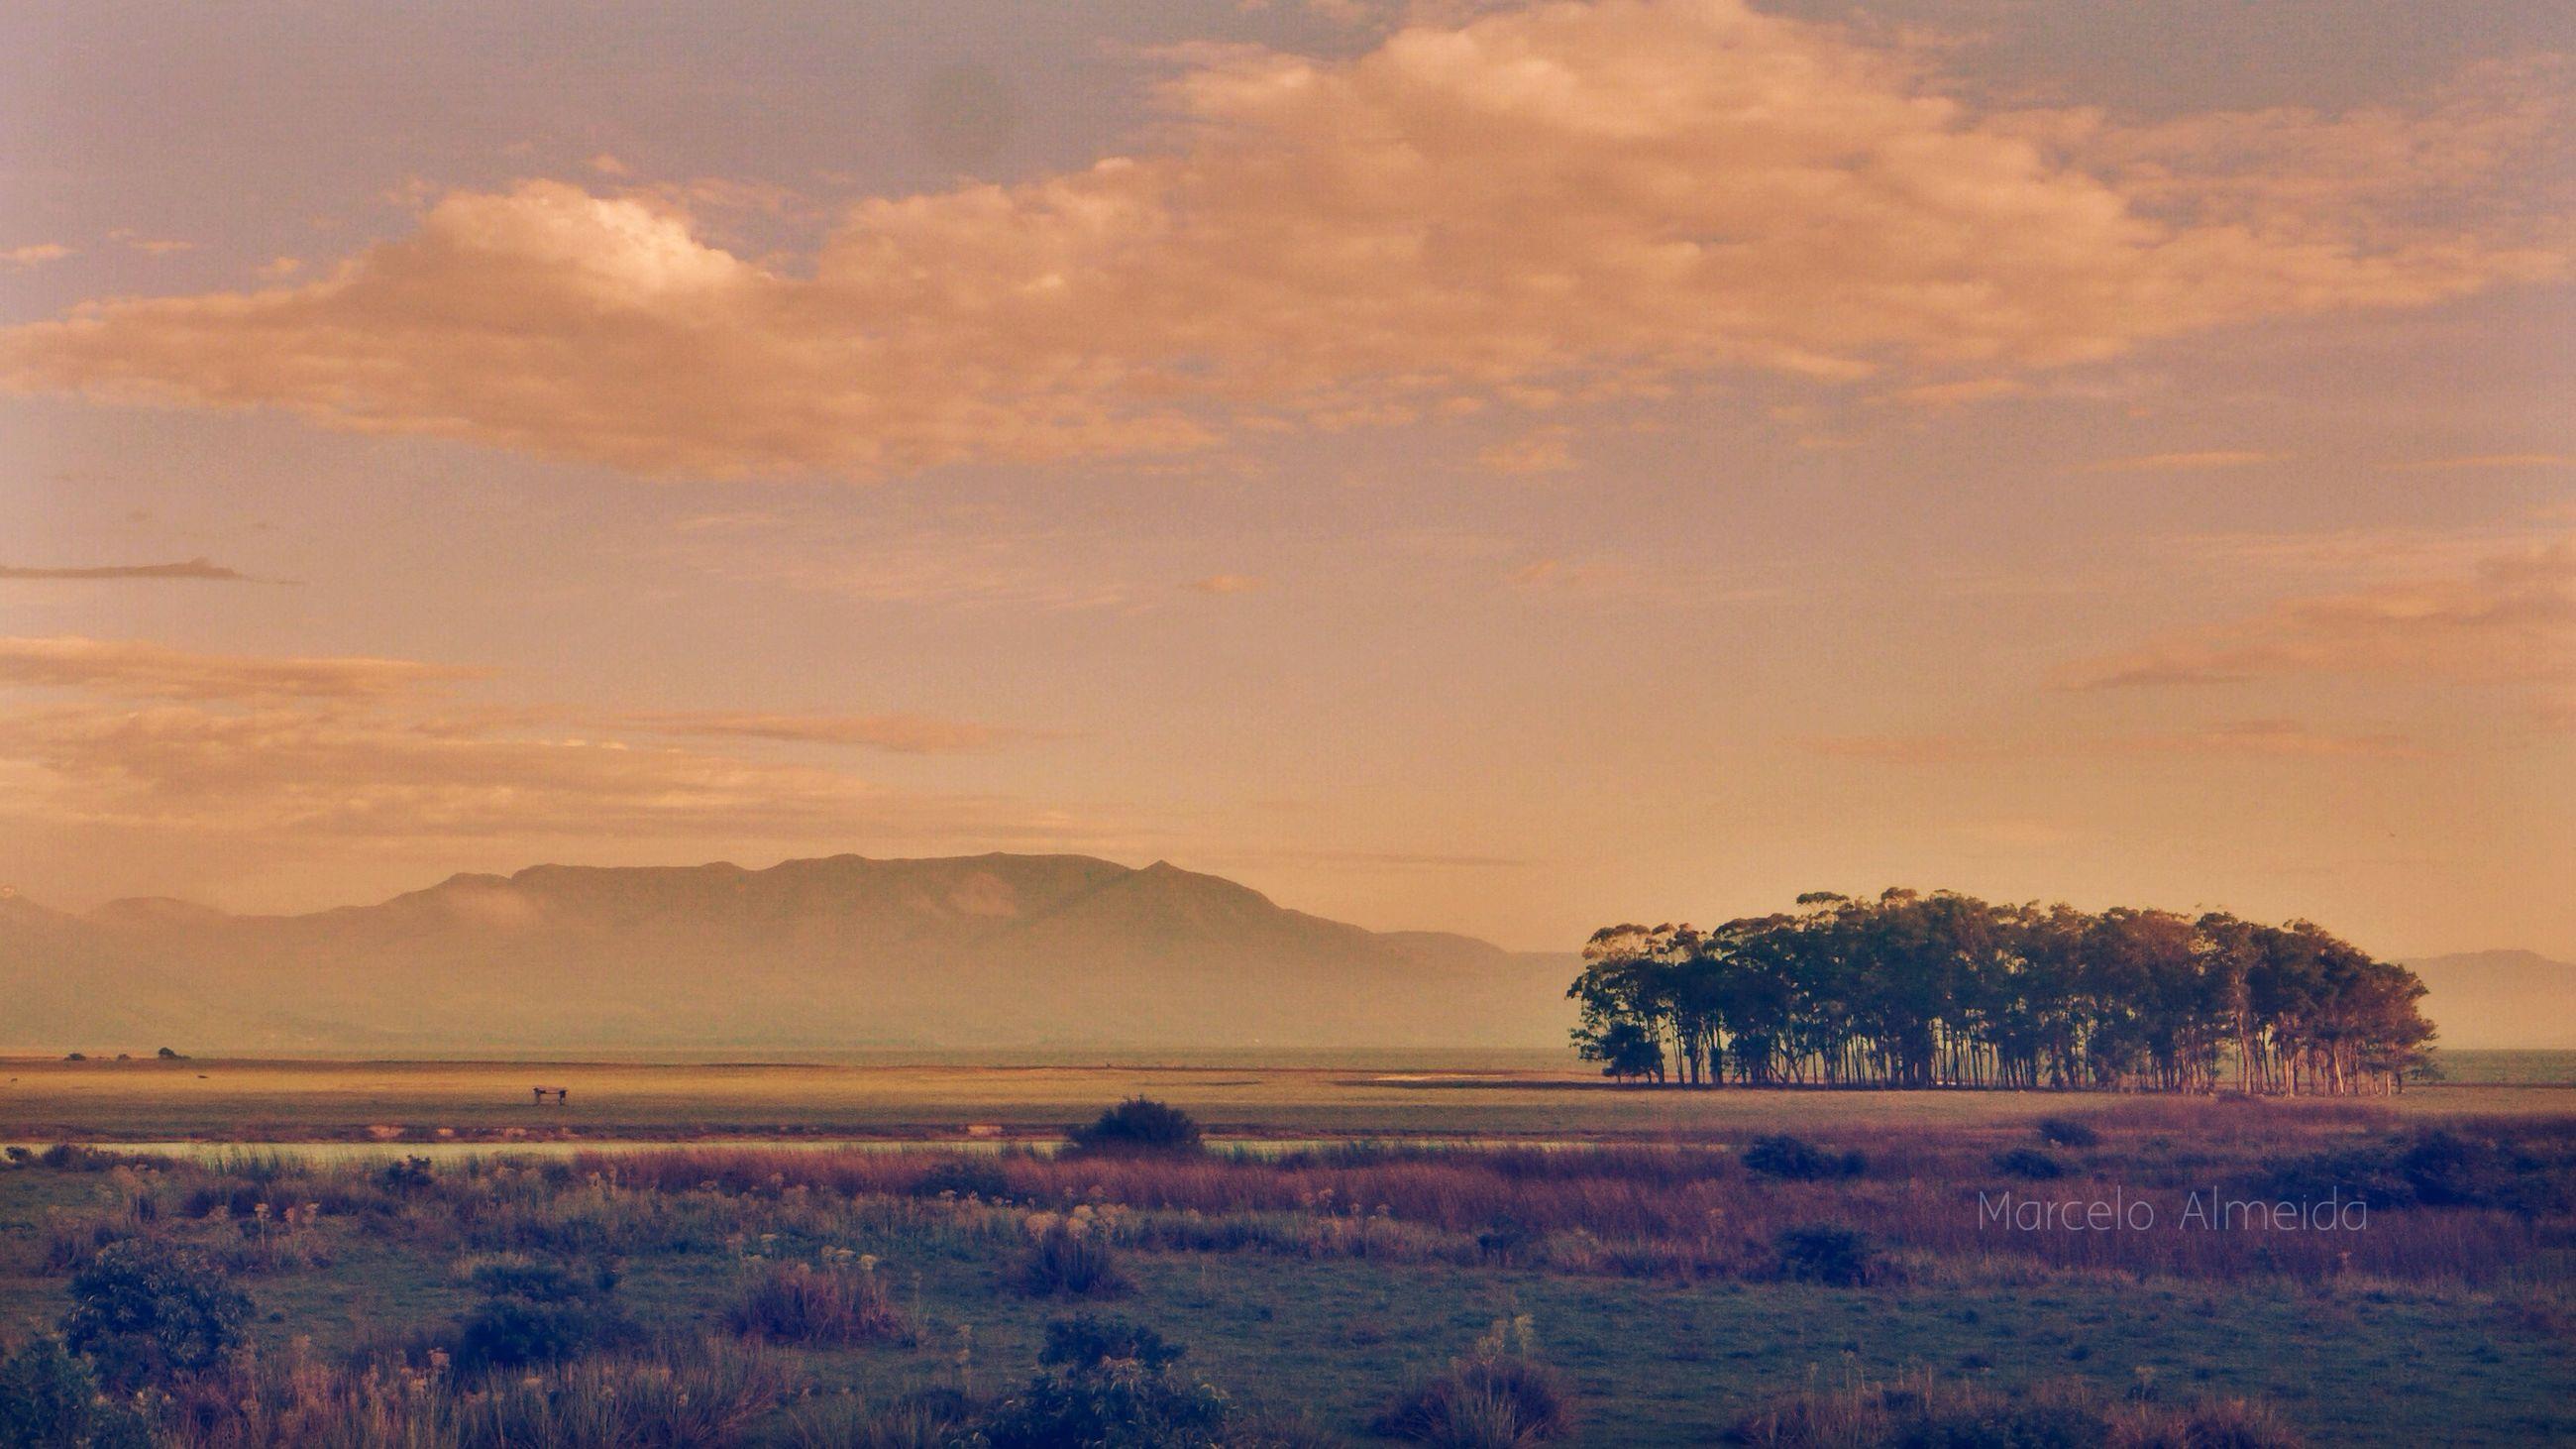 tranquil scene, tranquility, scenics, landscape, sunset, sky, beauty in nature, mountain, nature, non-urban scene, tree, idyllic, mountain range, cloud - sky, field, cloud, remote, silhouette, horizon over land, orange color